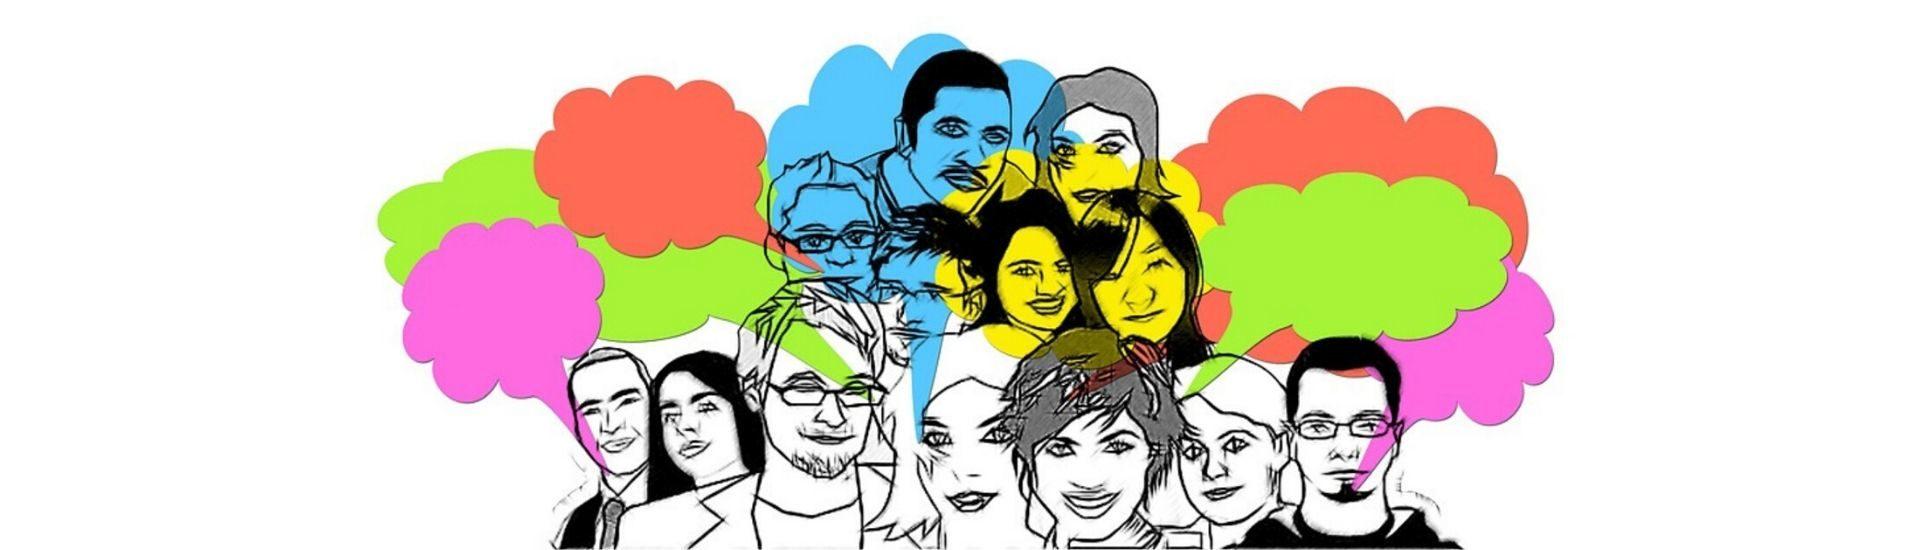 Dibujo de rostros de diferentes personas